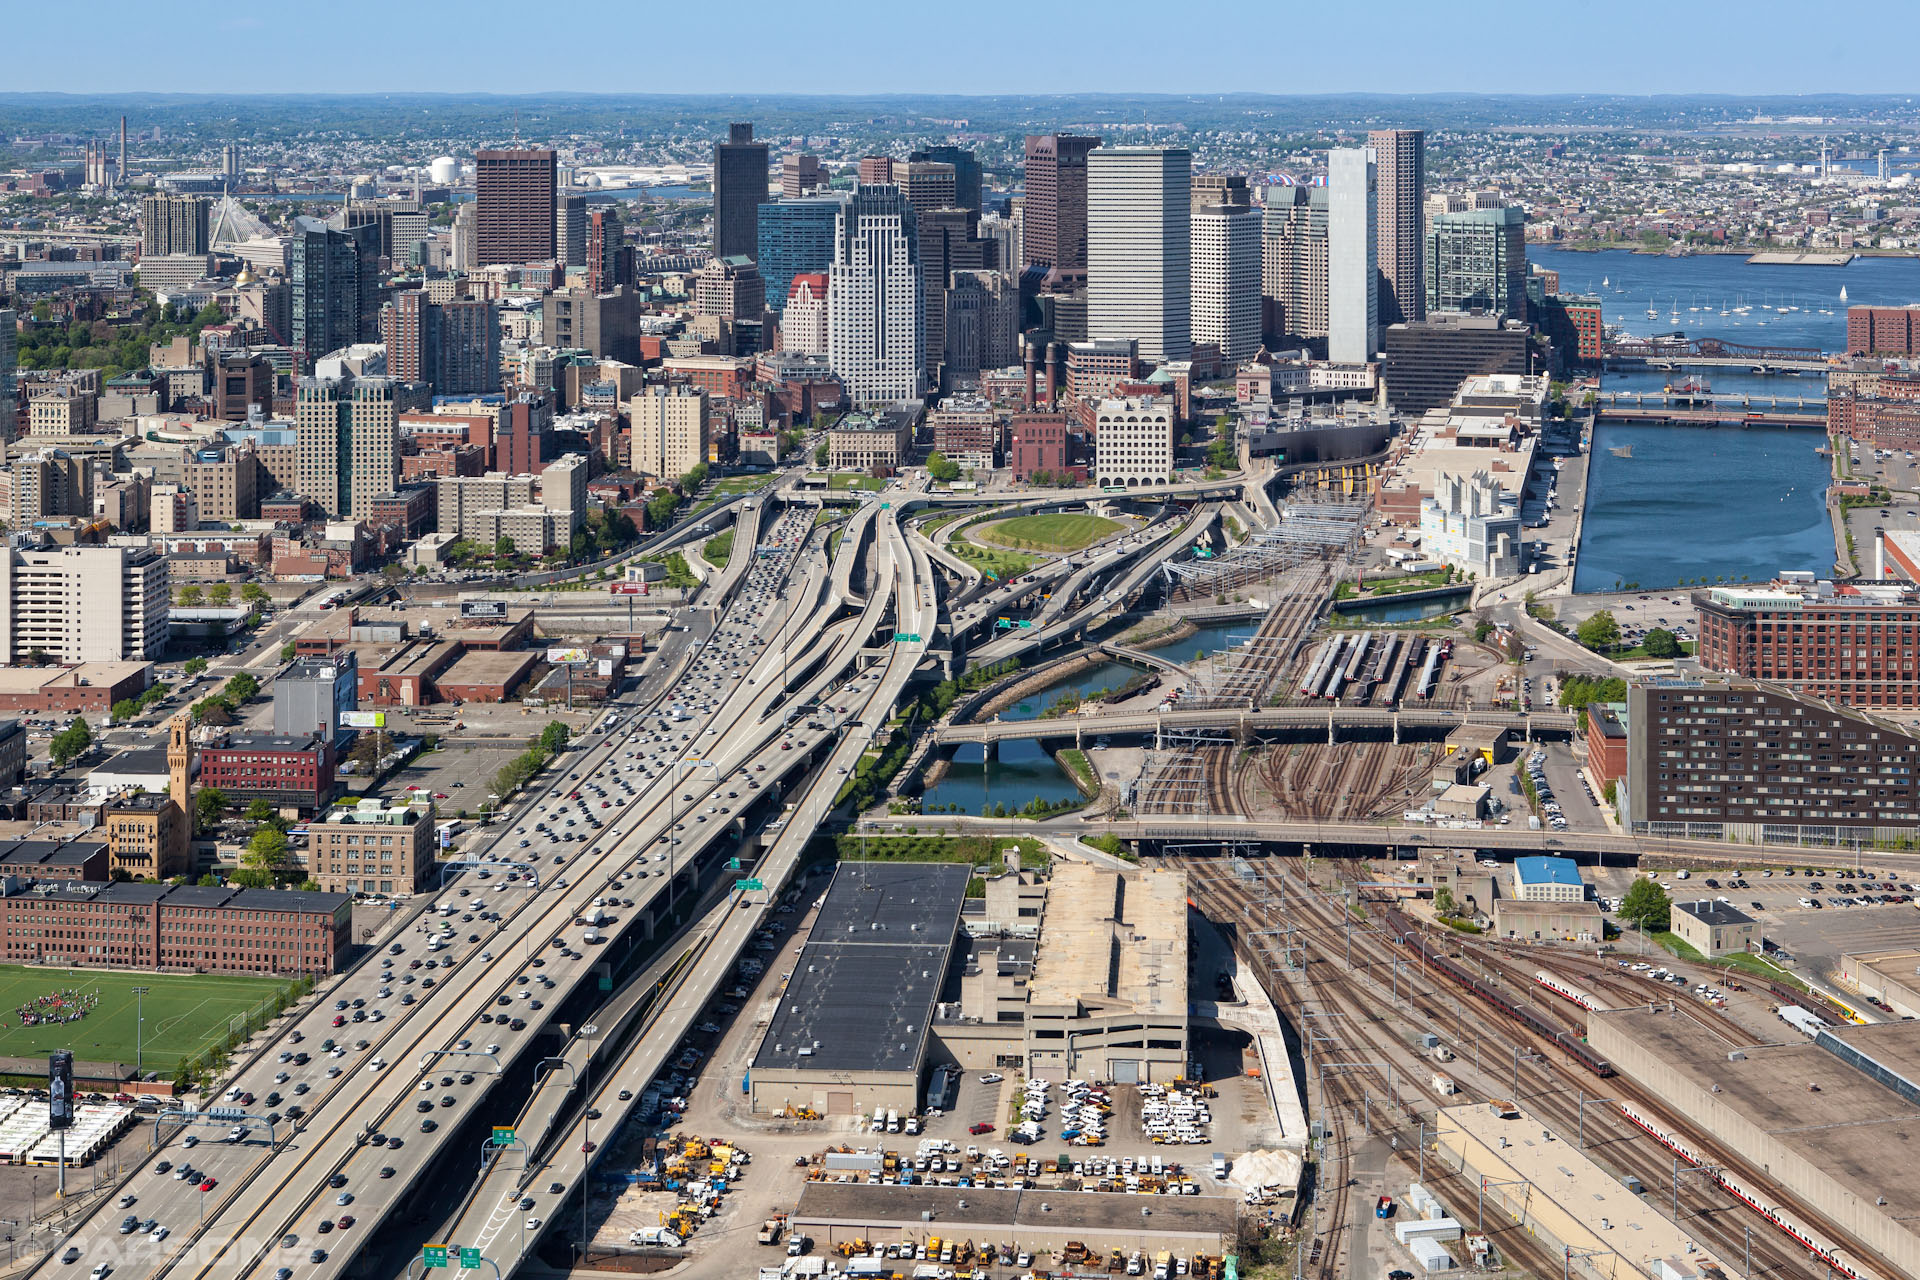 Civil-Engineering-Aerial-Boston-Highway-I93-Massachusetts-Jason-Bax.JPG